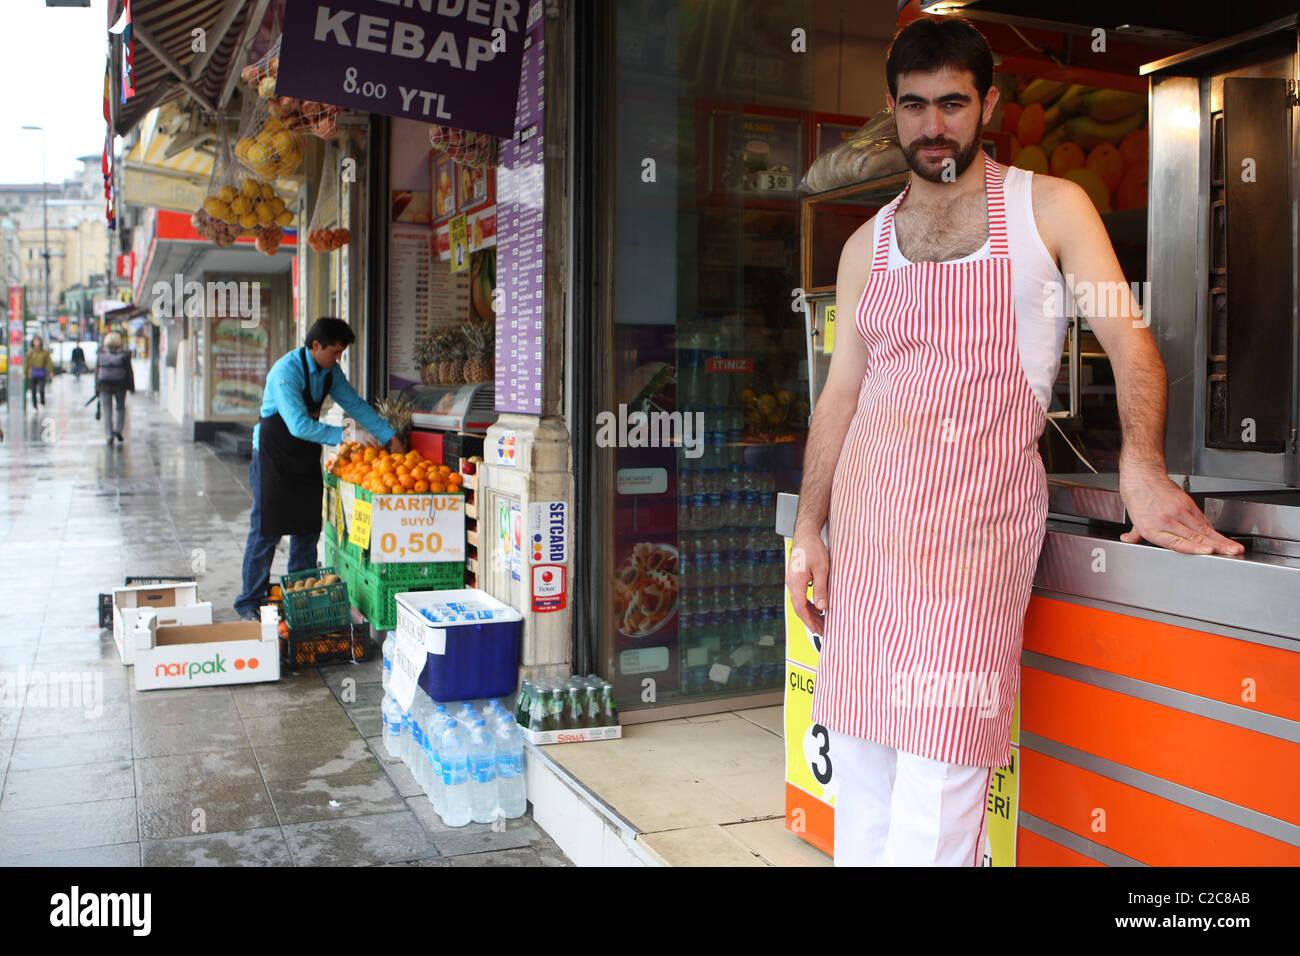 Tuerkei- Istanbul, 2008-09-28, street vendor snack arab late night male late - Stock Image